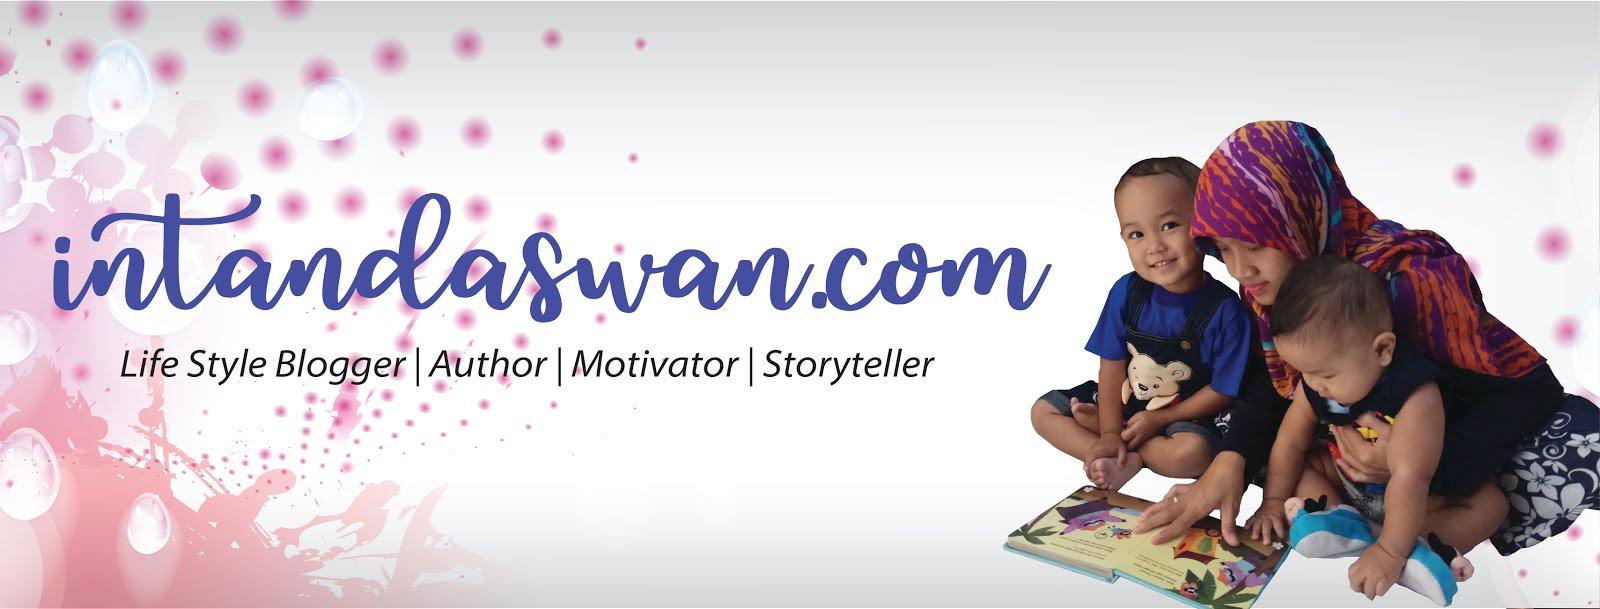 Intan Daswan